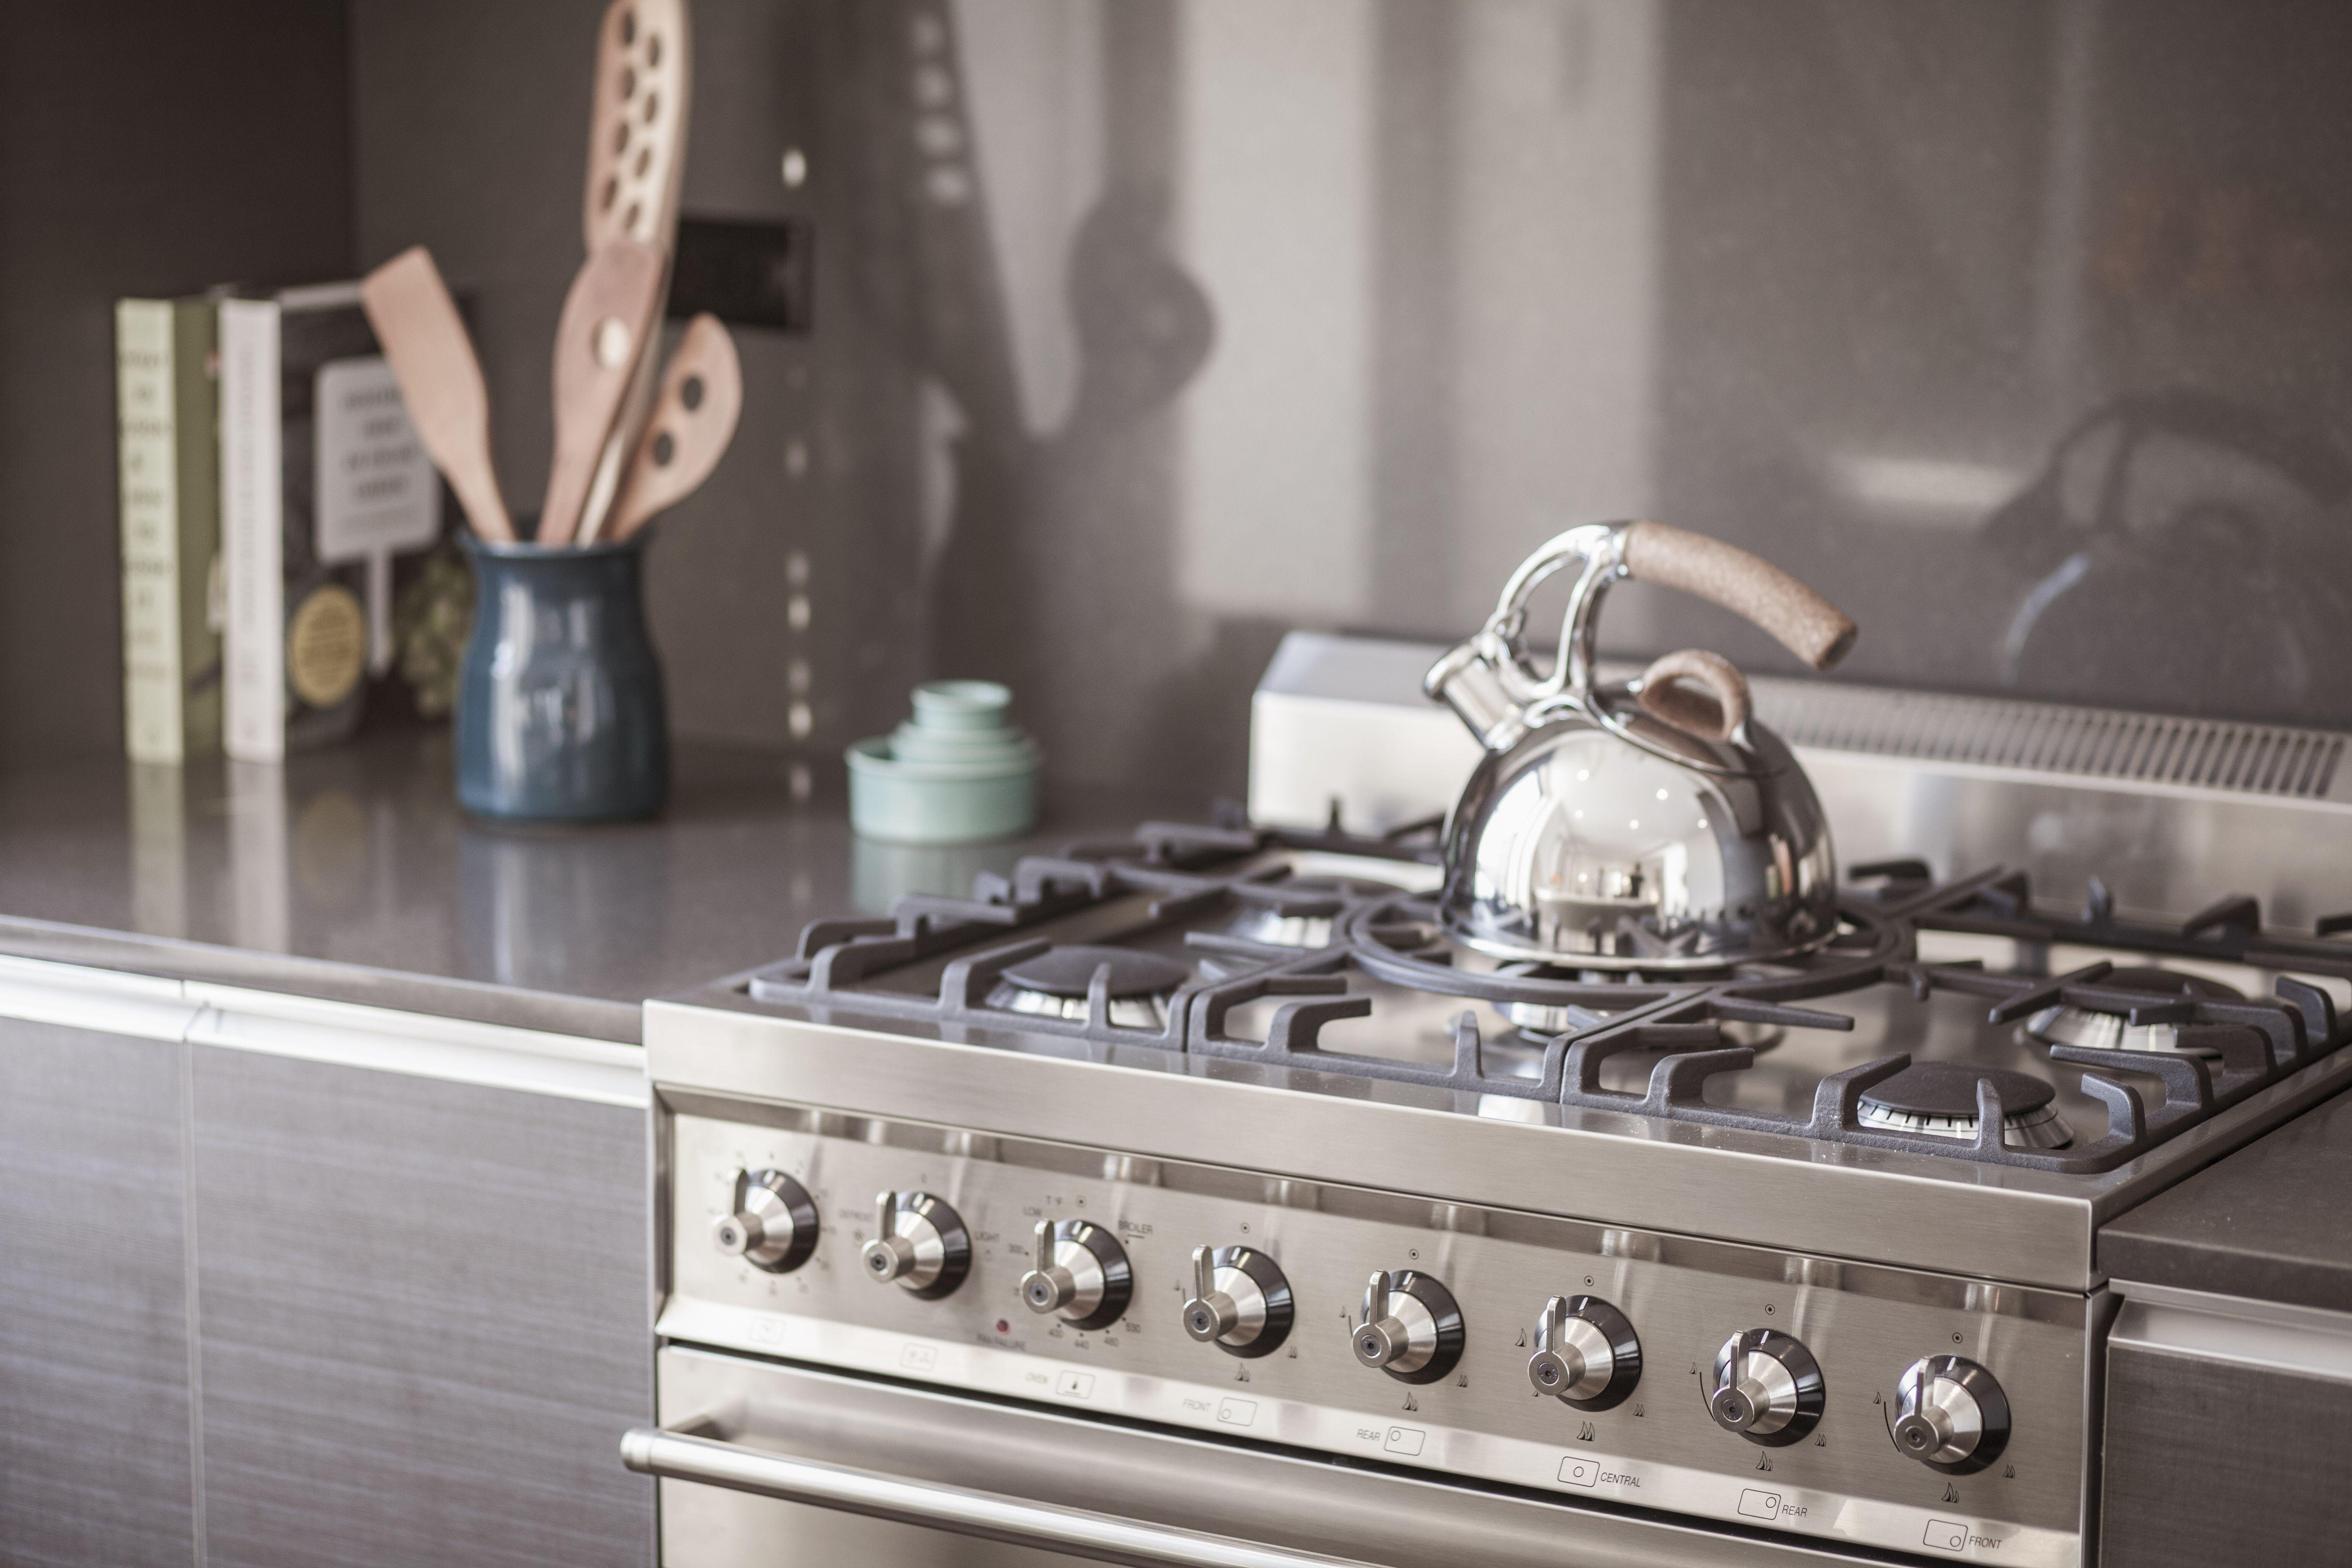 wood burning pellet heat stove or insert buying tips